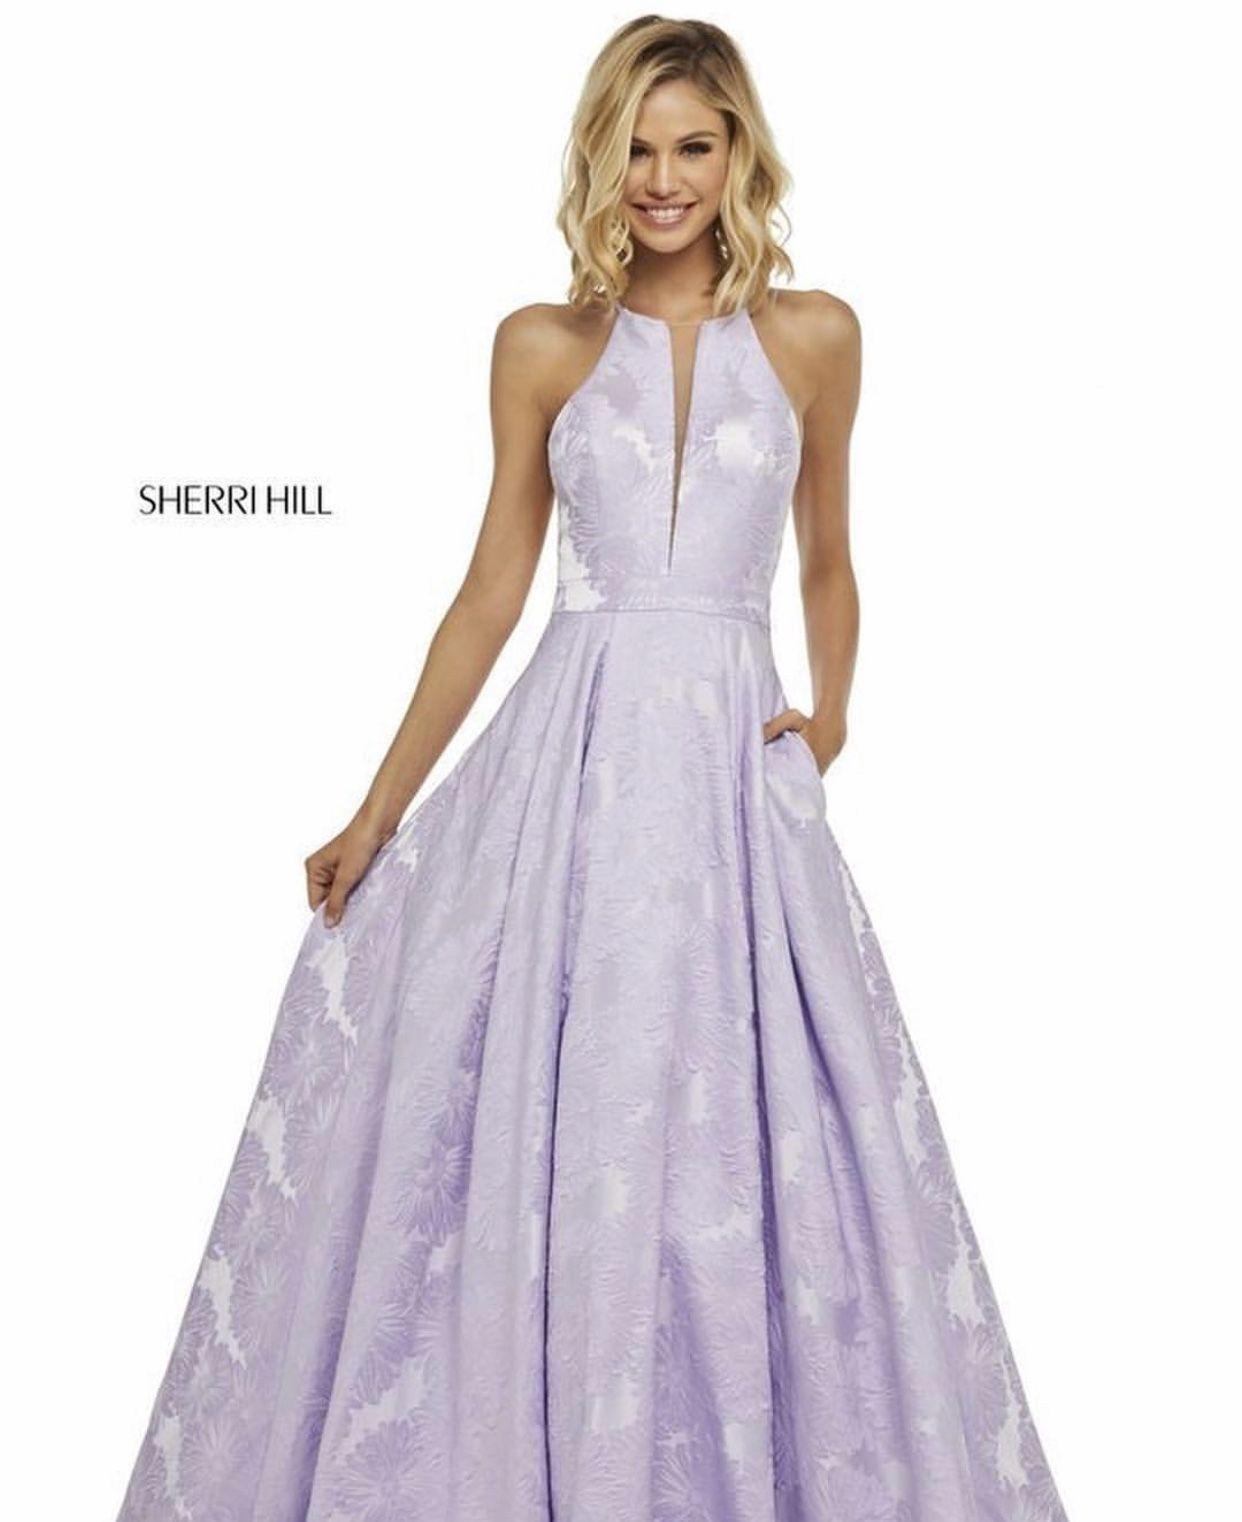 32345b20b80c scarlett leithold | Scarlett Leithold in 2019 | Lilac prom dresses ...